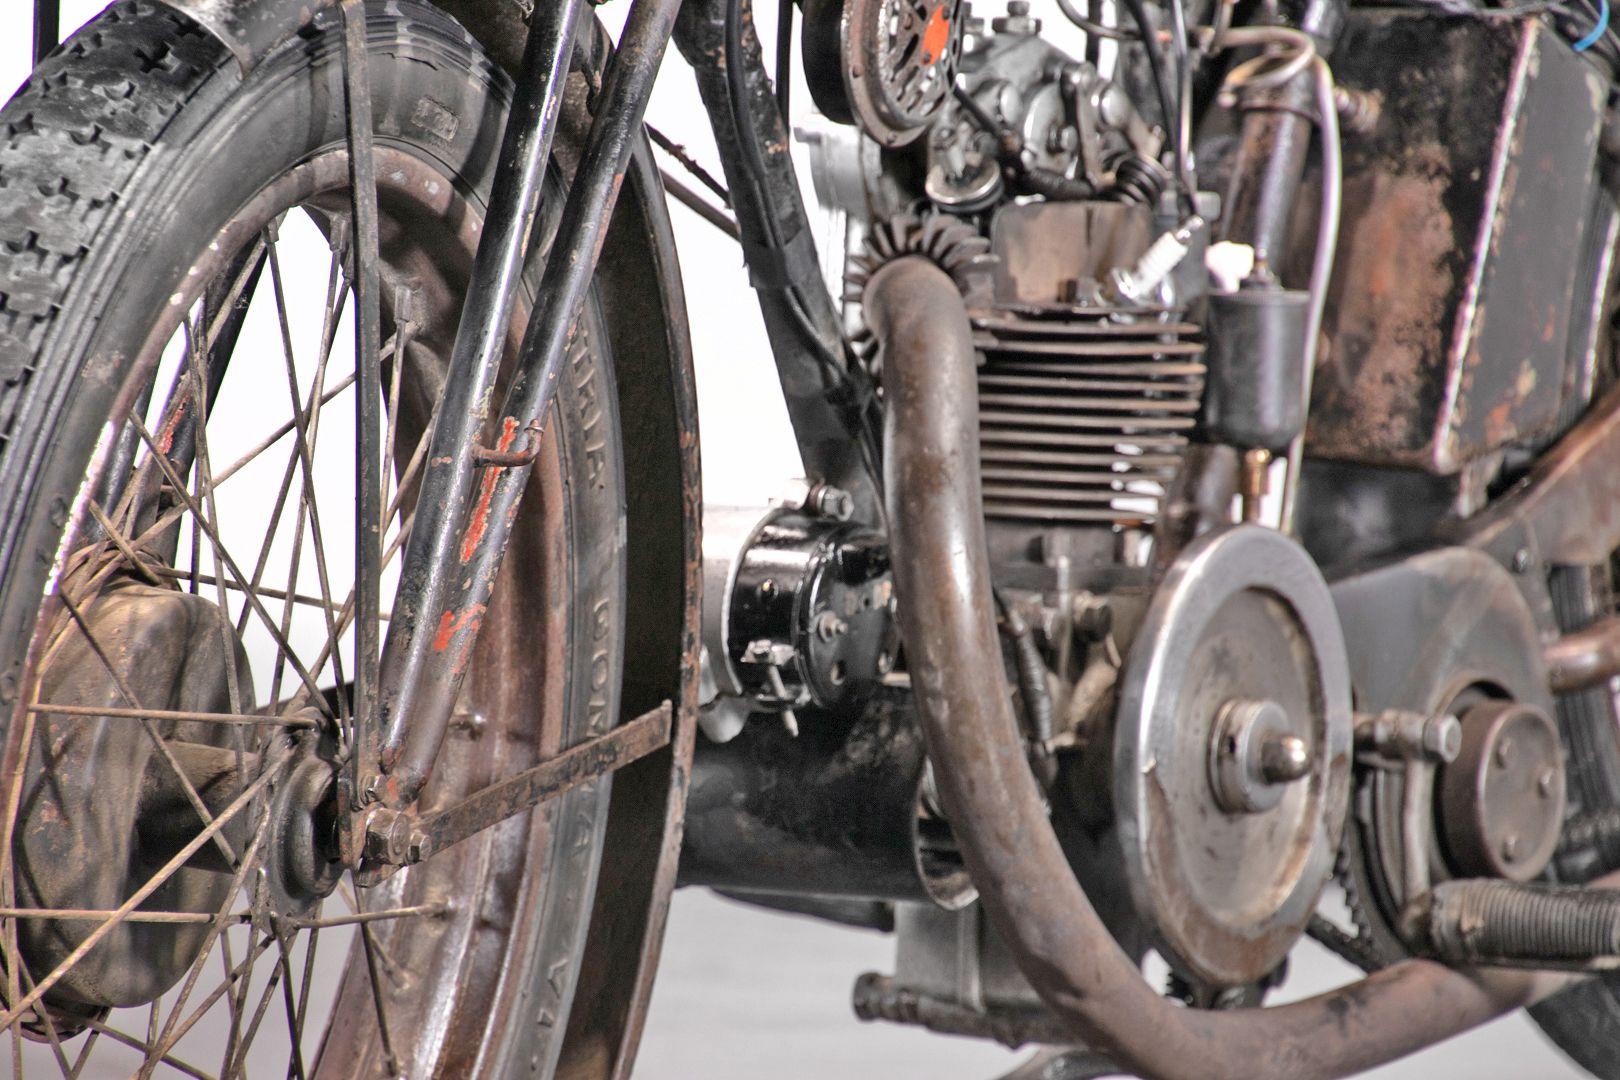 1938 Benelli 175 74492